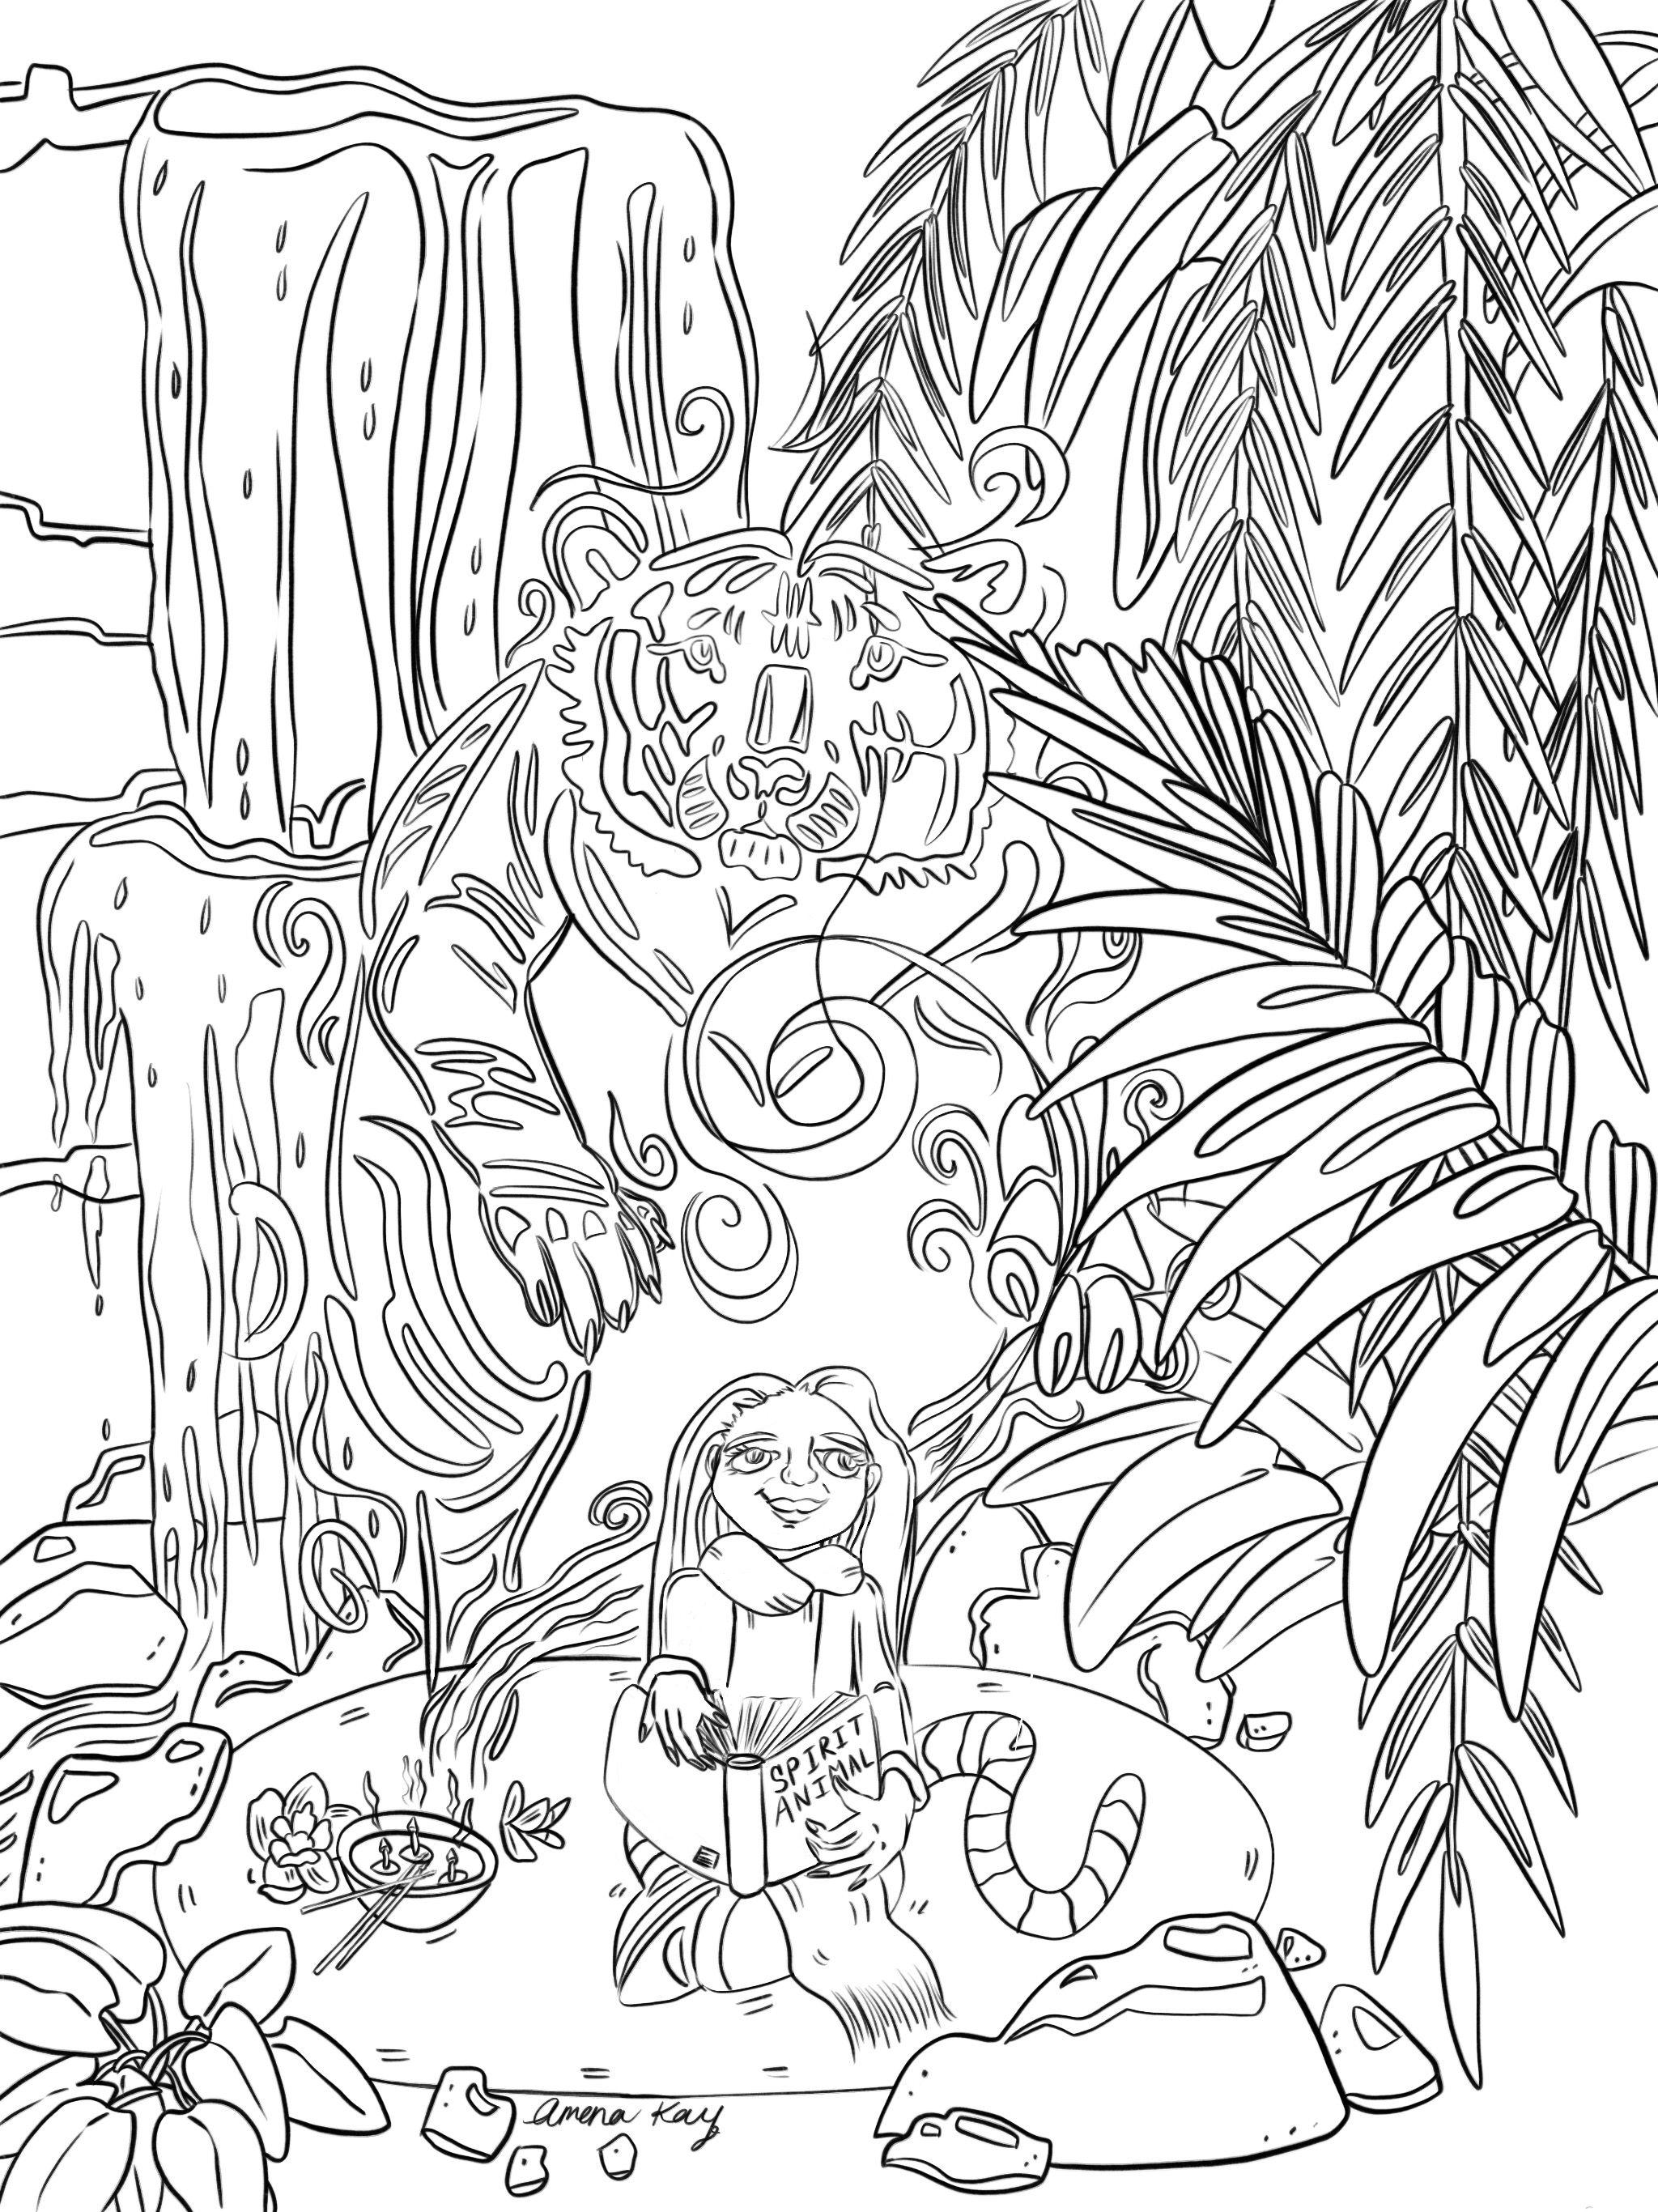 spirit animal coloring page amena kay free coloring pages